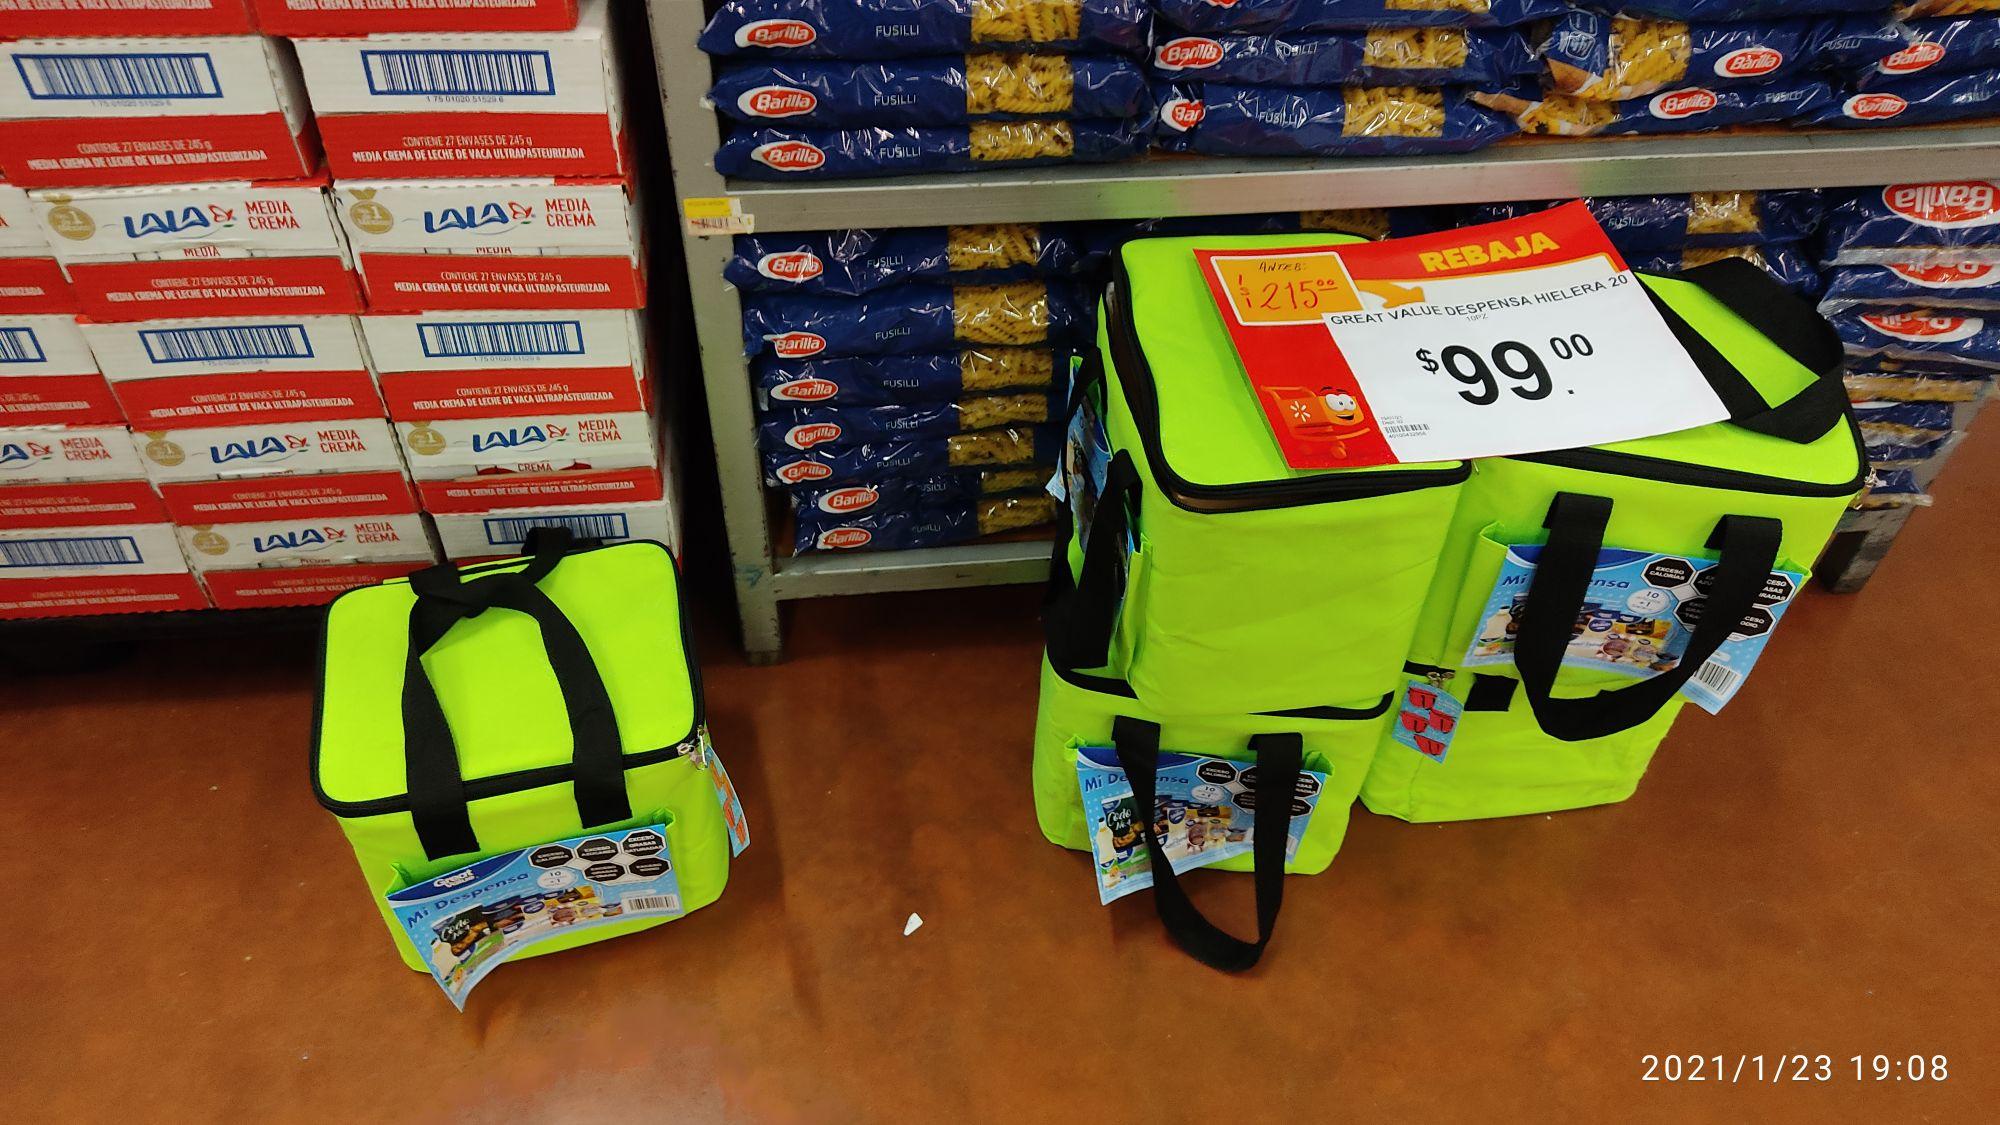 Walmart: Hielera con 10 productos basicos